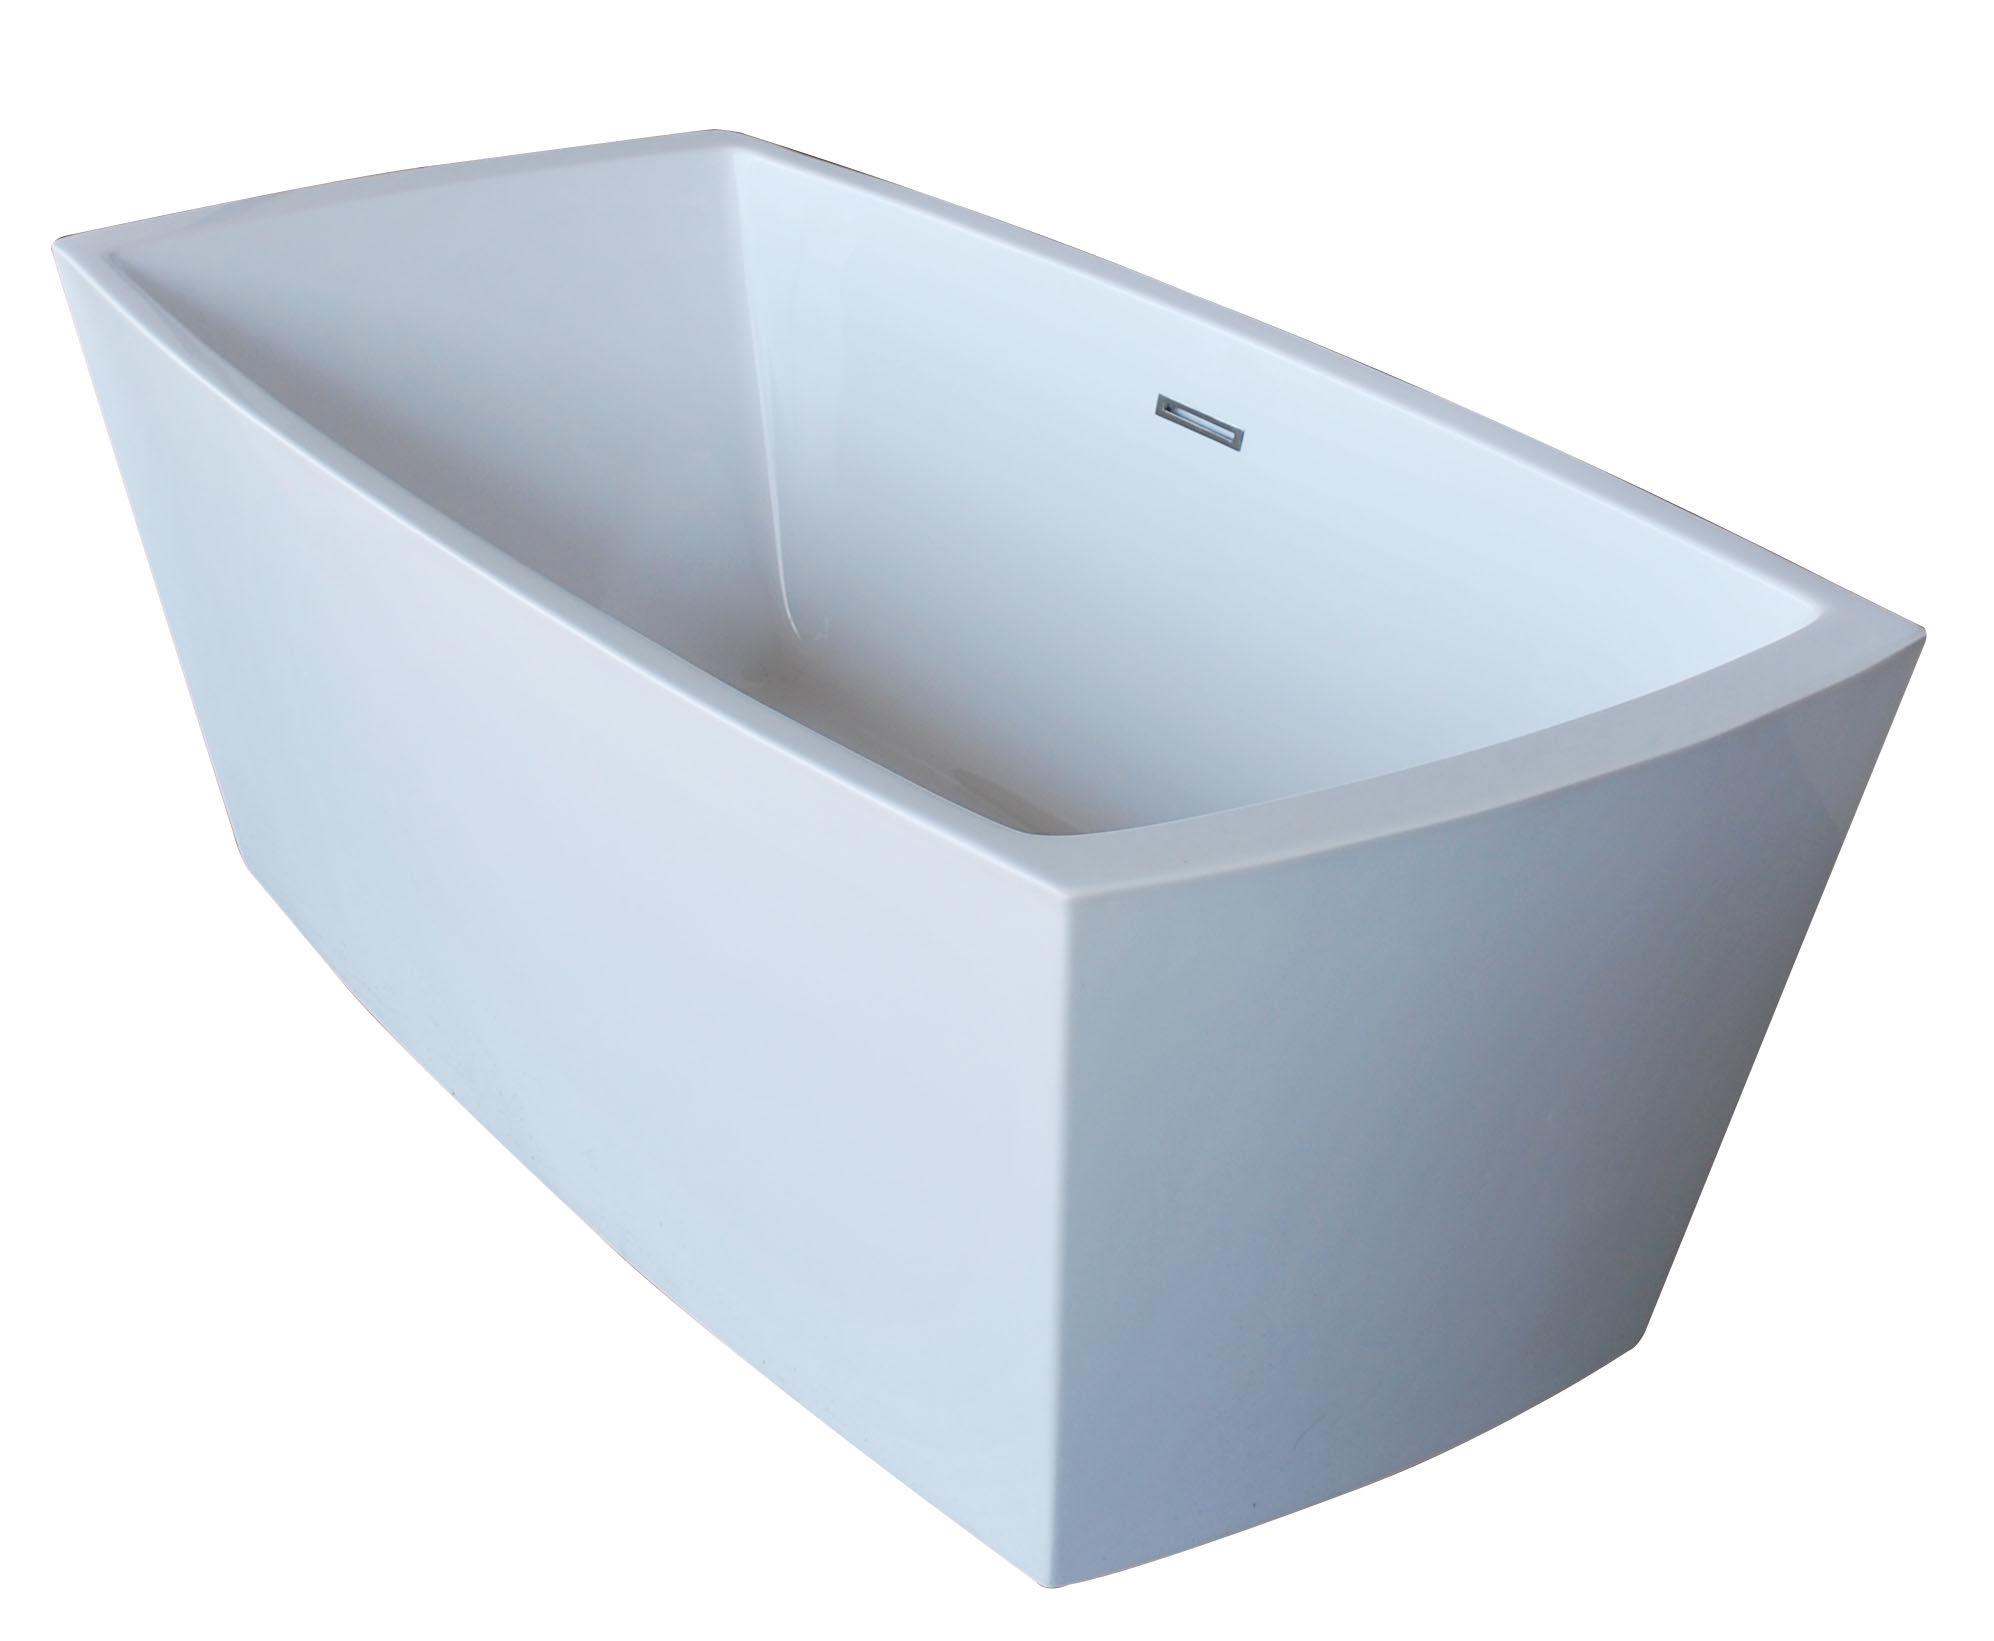 Avano Av6731atsxcwxx White Freestanding Bathtubs 67 Acrylic Soaking Bathtub For Freestanding Installations With Reversible Drain Faucetdirect Com